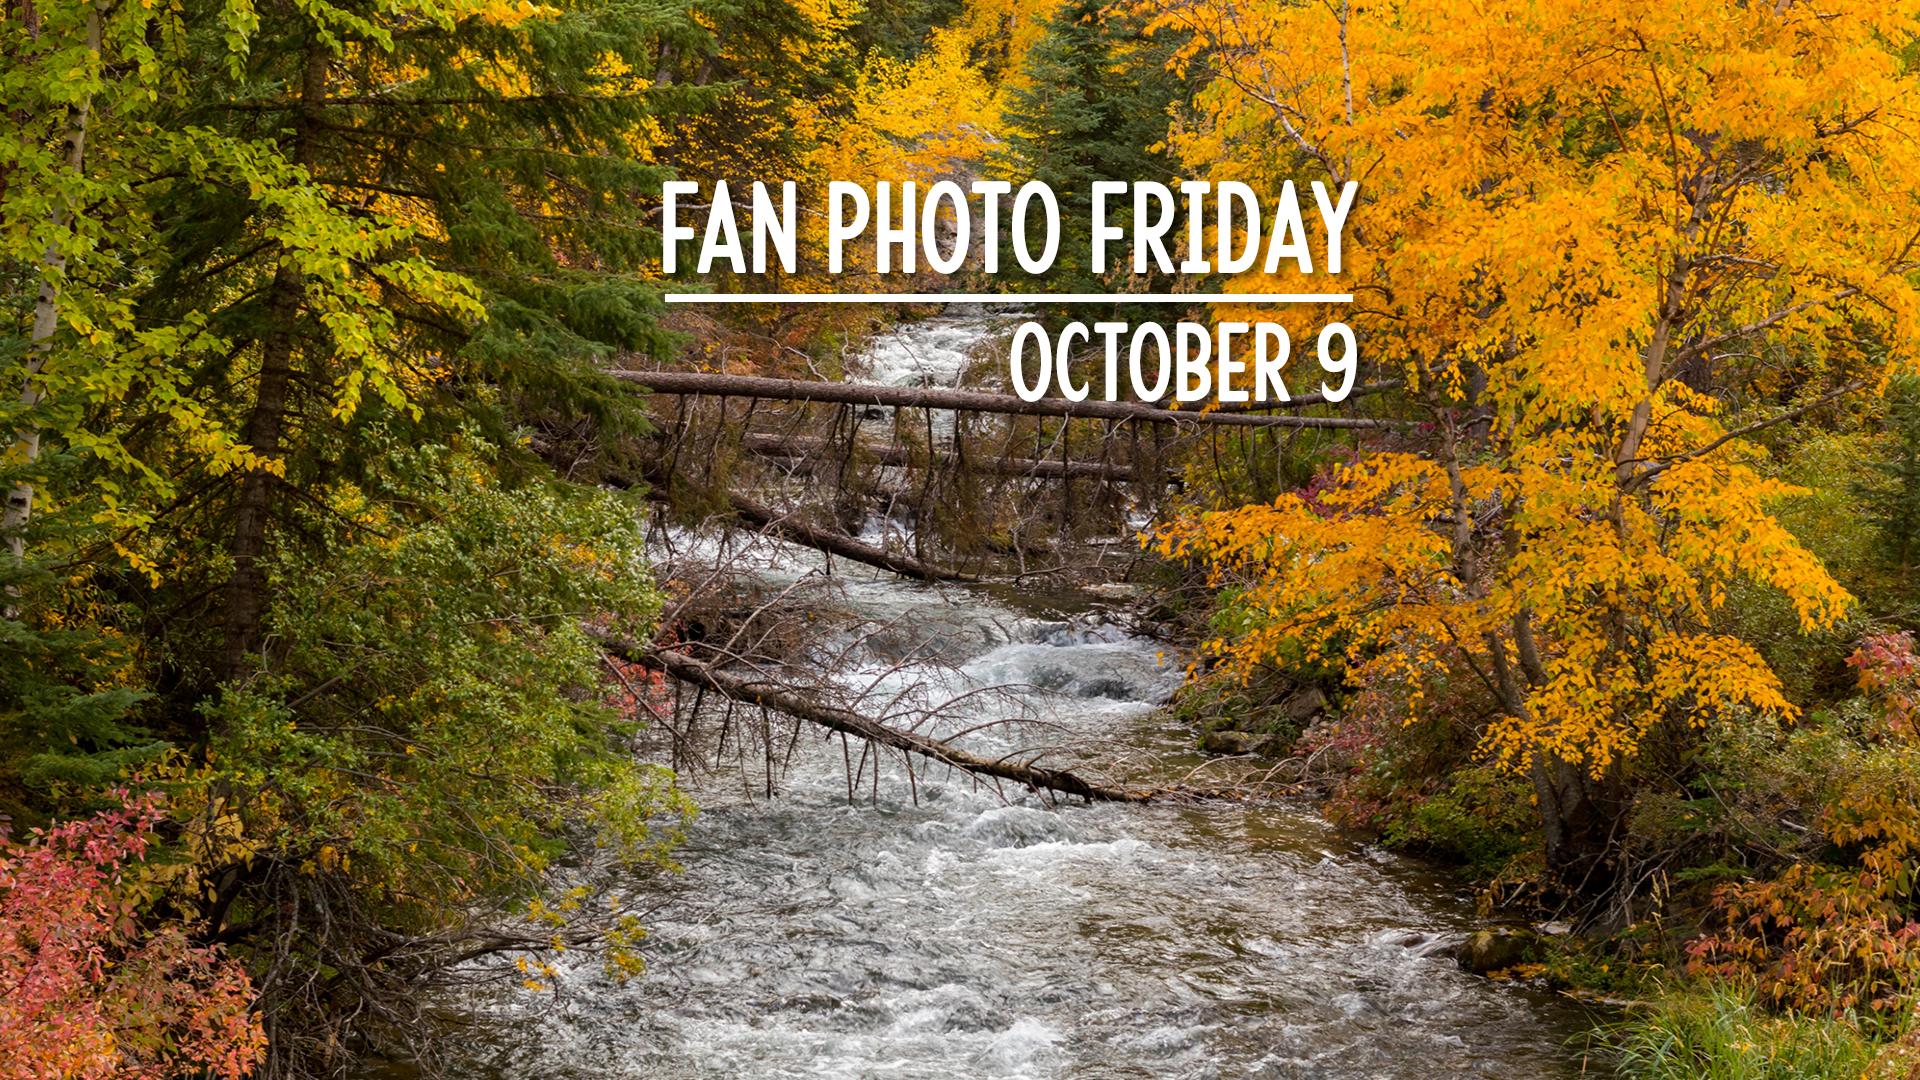 Fan Photo Friday   October 9, 2020